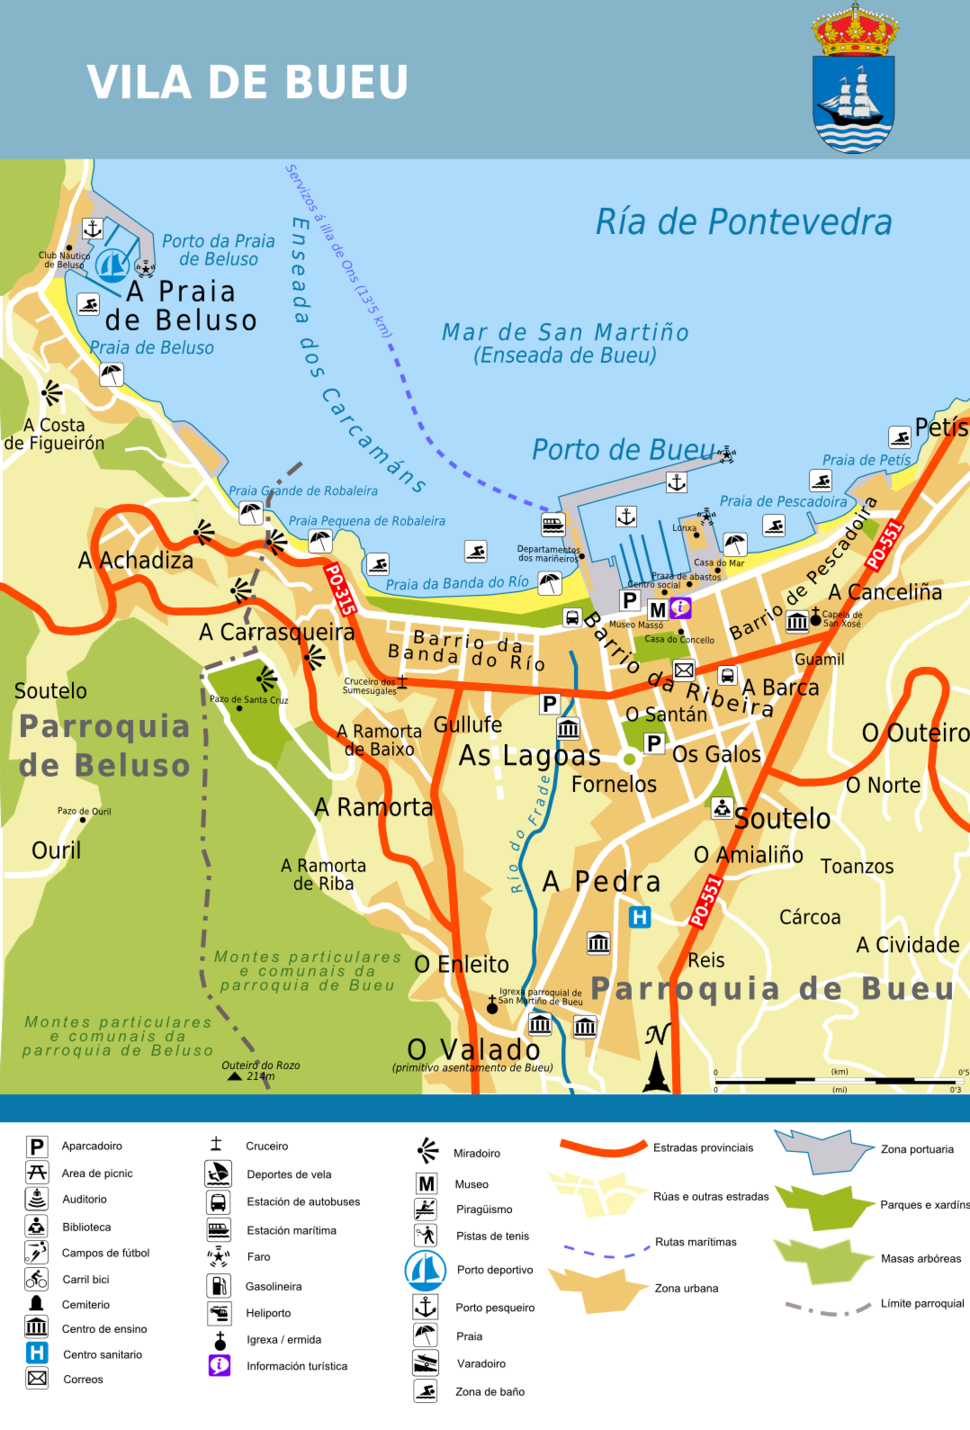 Plano vila de Bueu